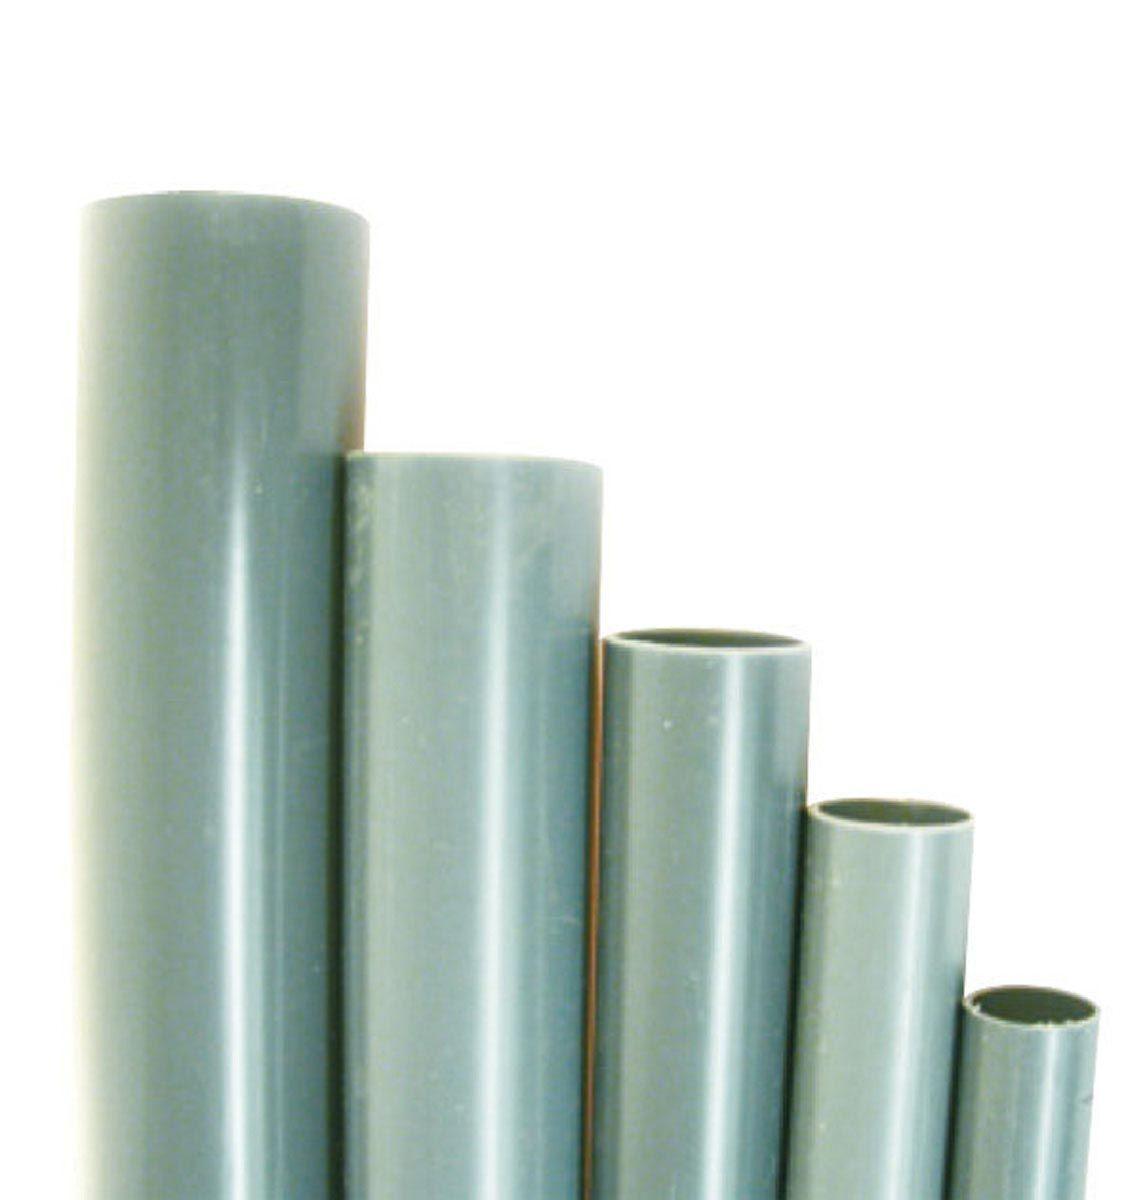 Rohr, aus PVC, grau, L 2 m, D 20 x 1.5 mm, PN 16